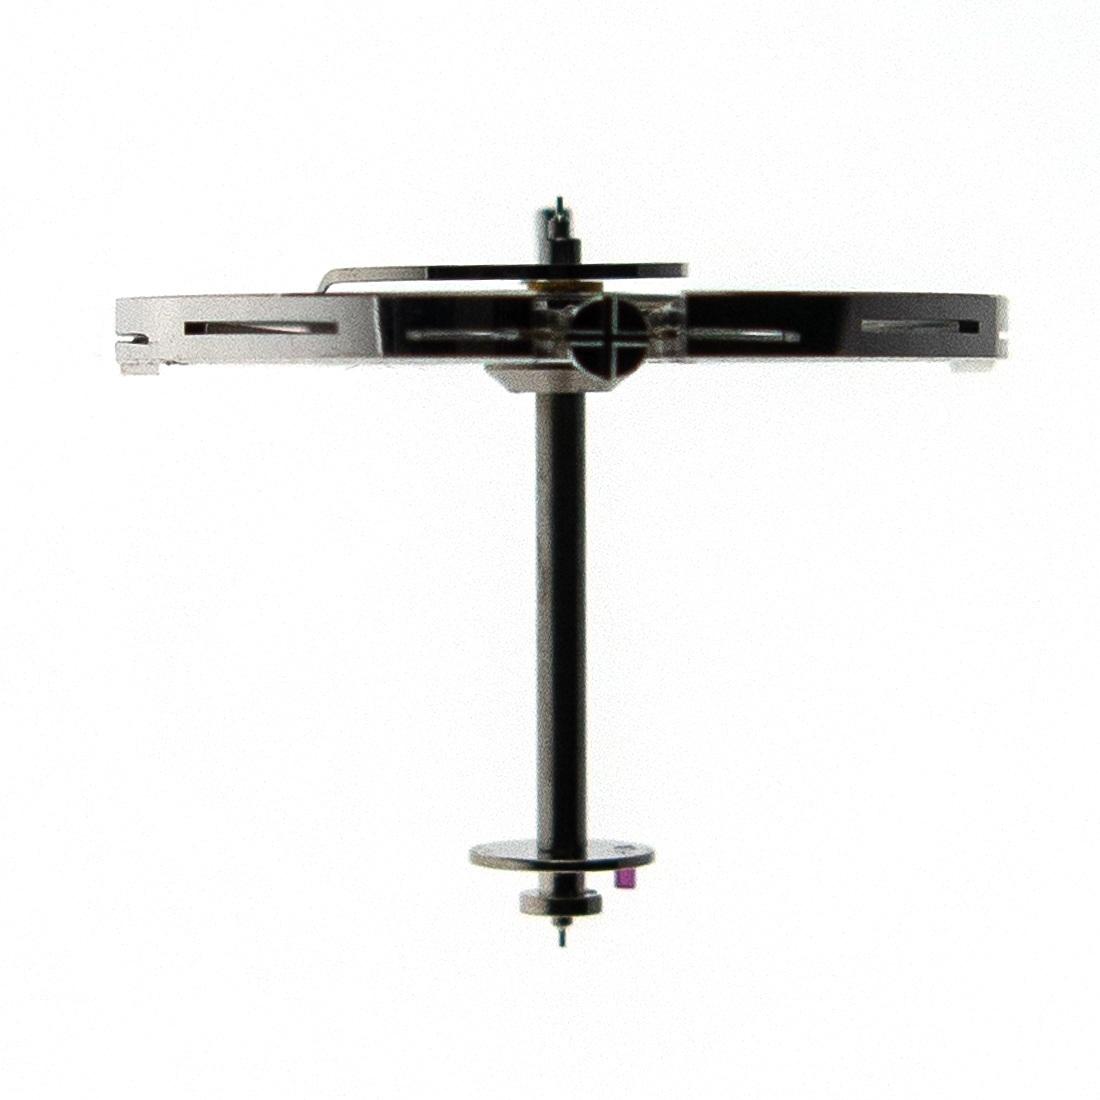 Balance wheel profile. The balance staff is 11.80mm long.